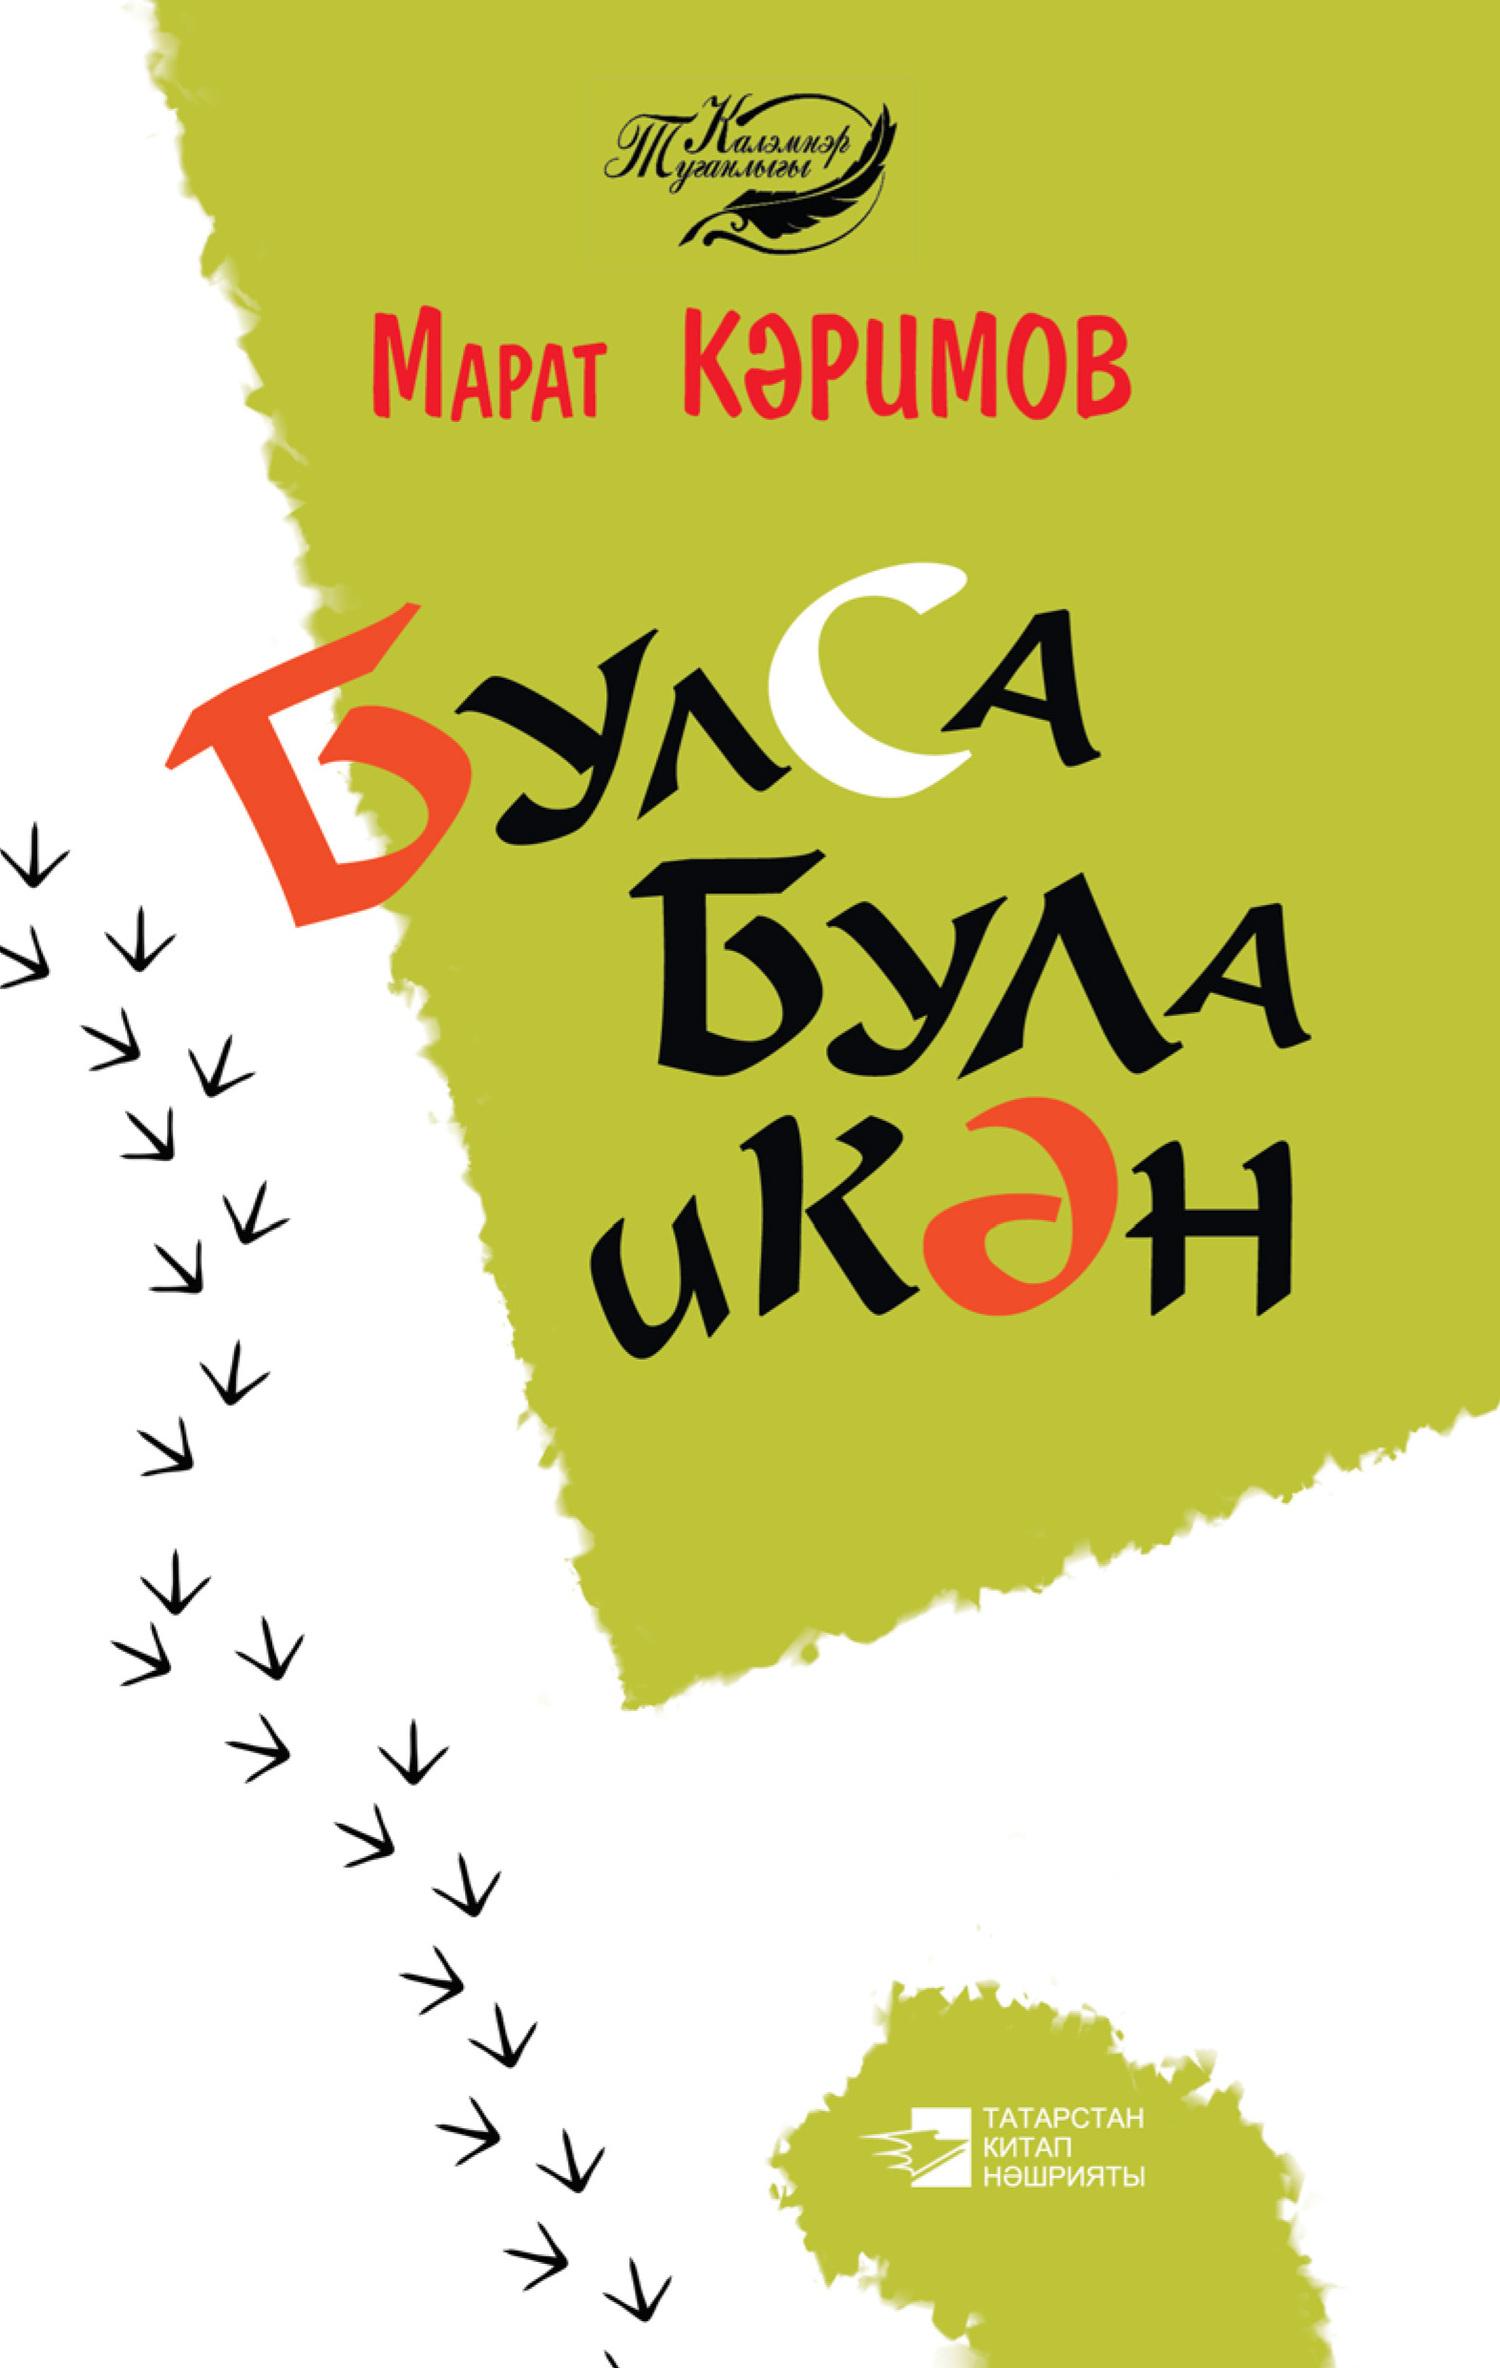 Марат Кәримов Булса була икән (җыентык) мой марат 2018 06 12t13 30